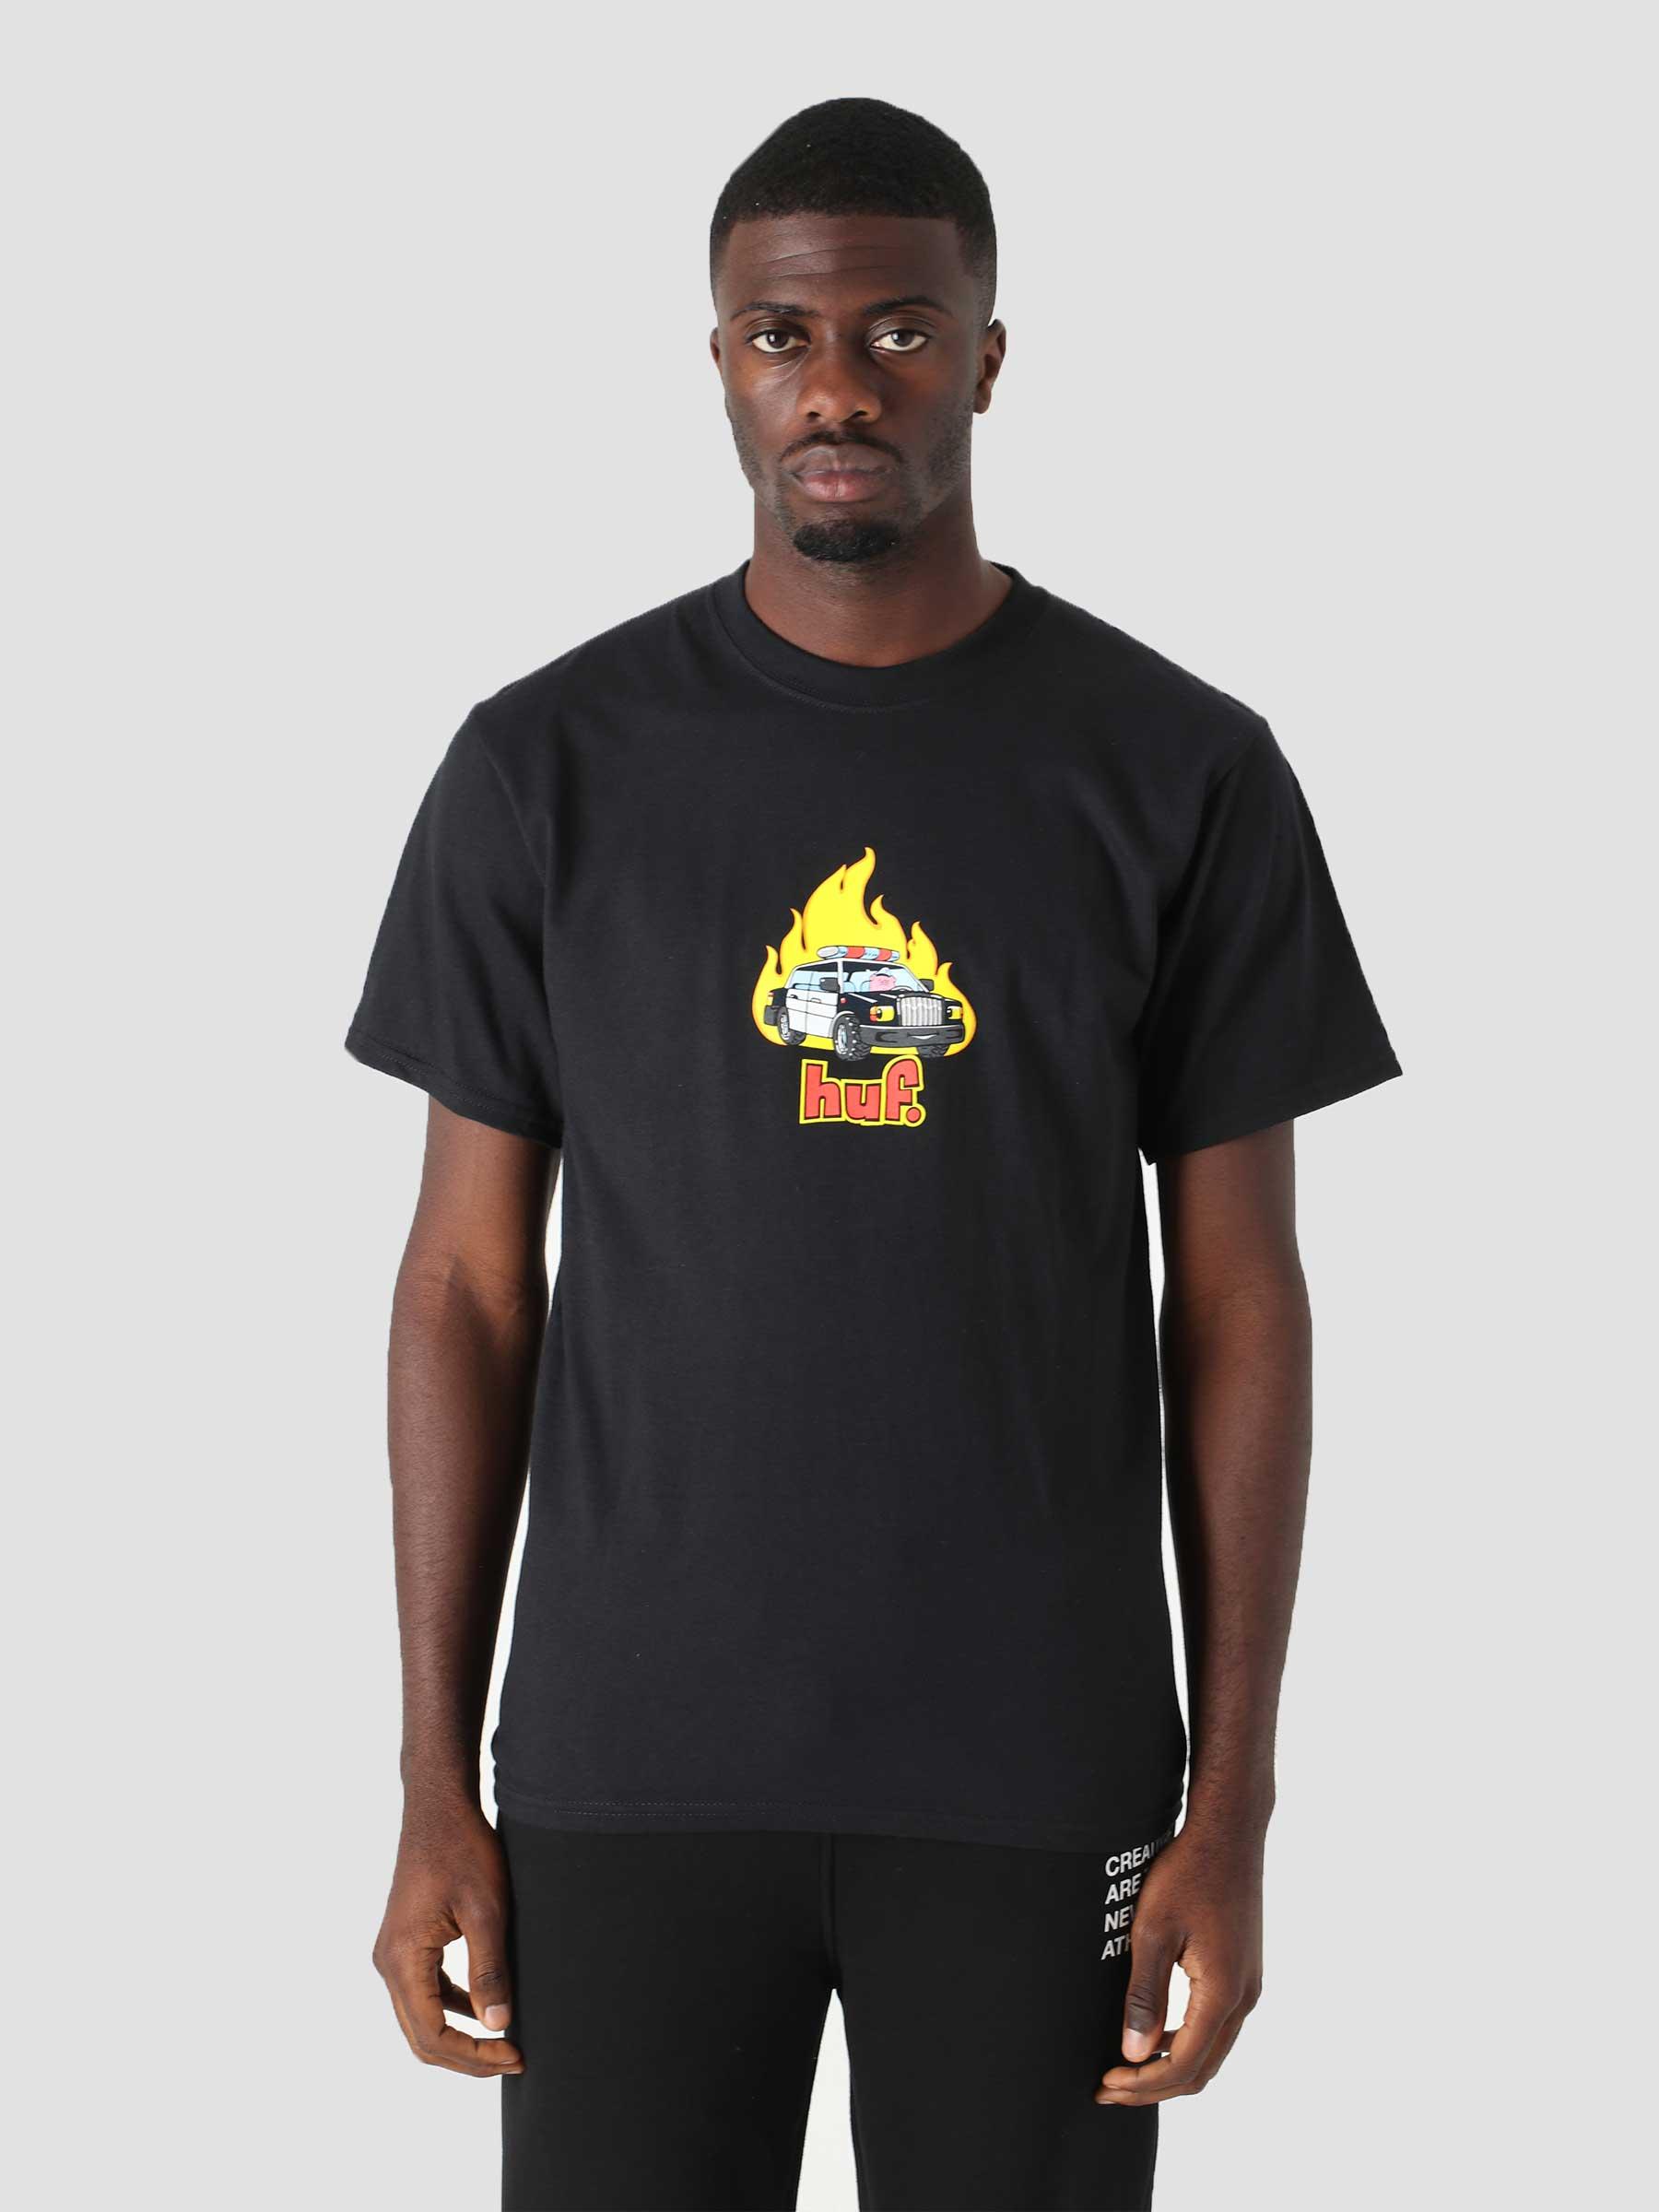 Roasted T-Shirt Black TS01506-BLACK